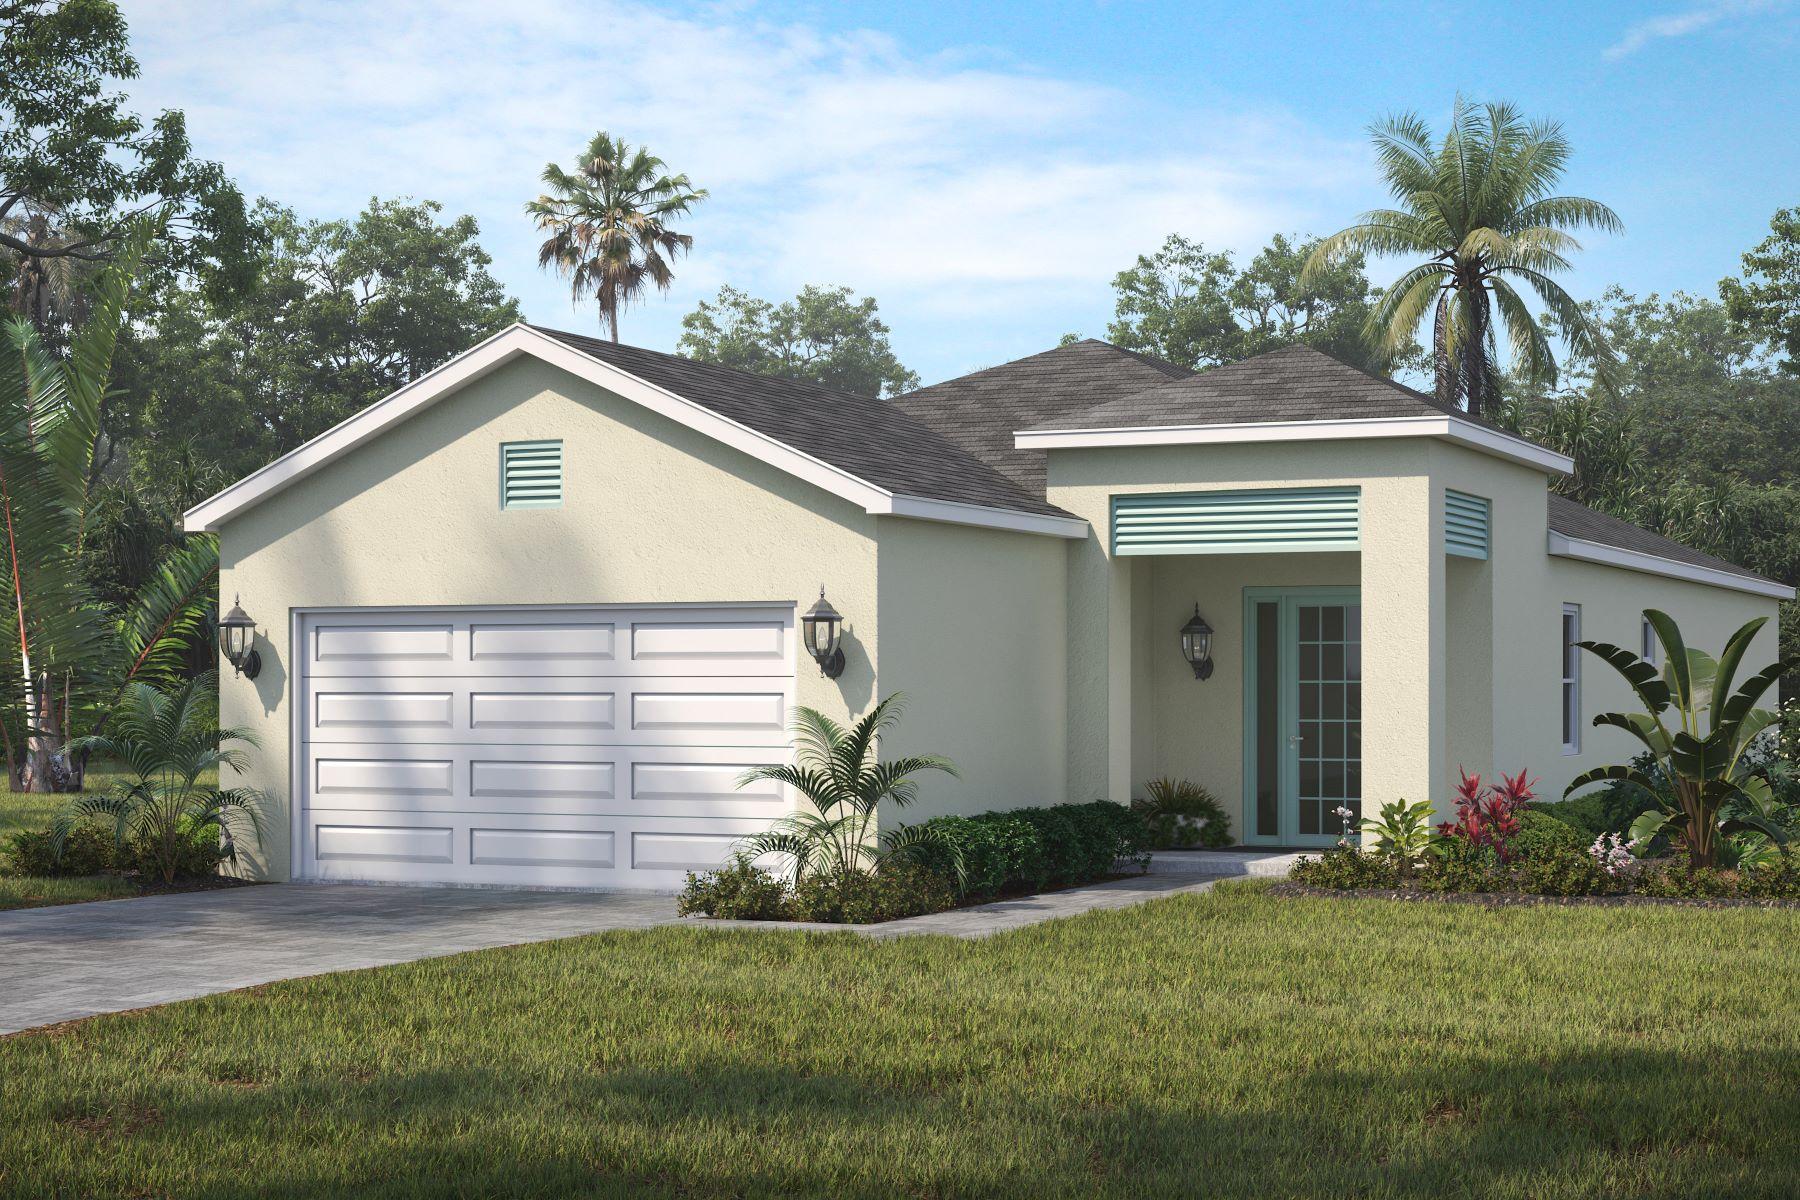 New Falls III Model! 2160 Falls Manor Vero Beach, Florida 32967 Stati Uniti